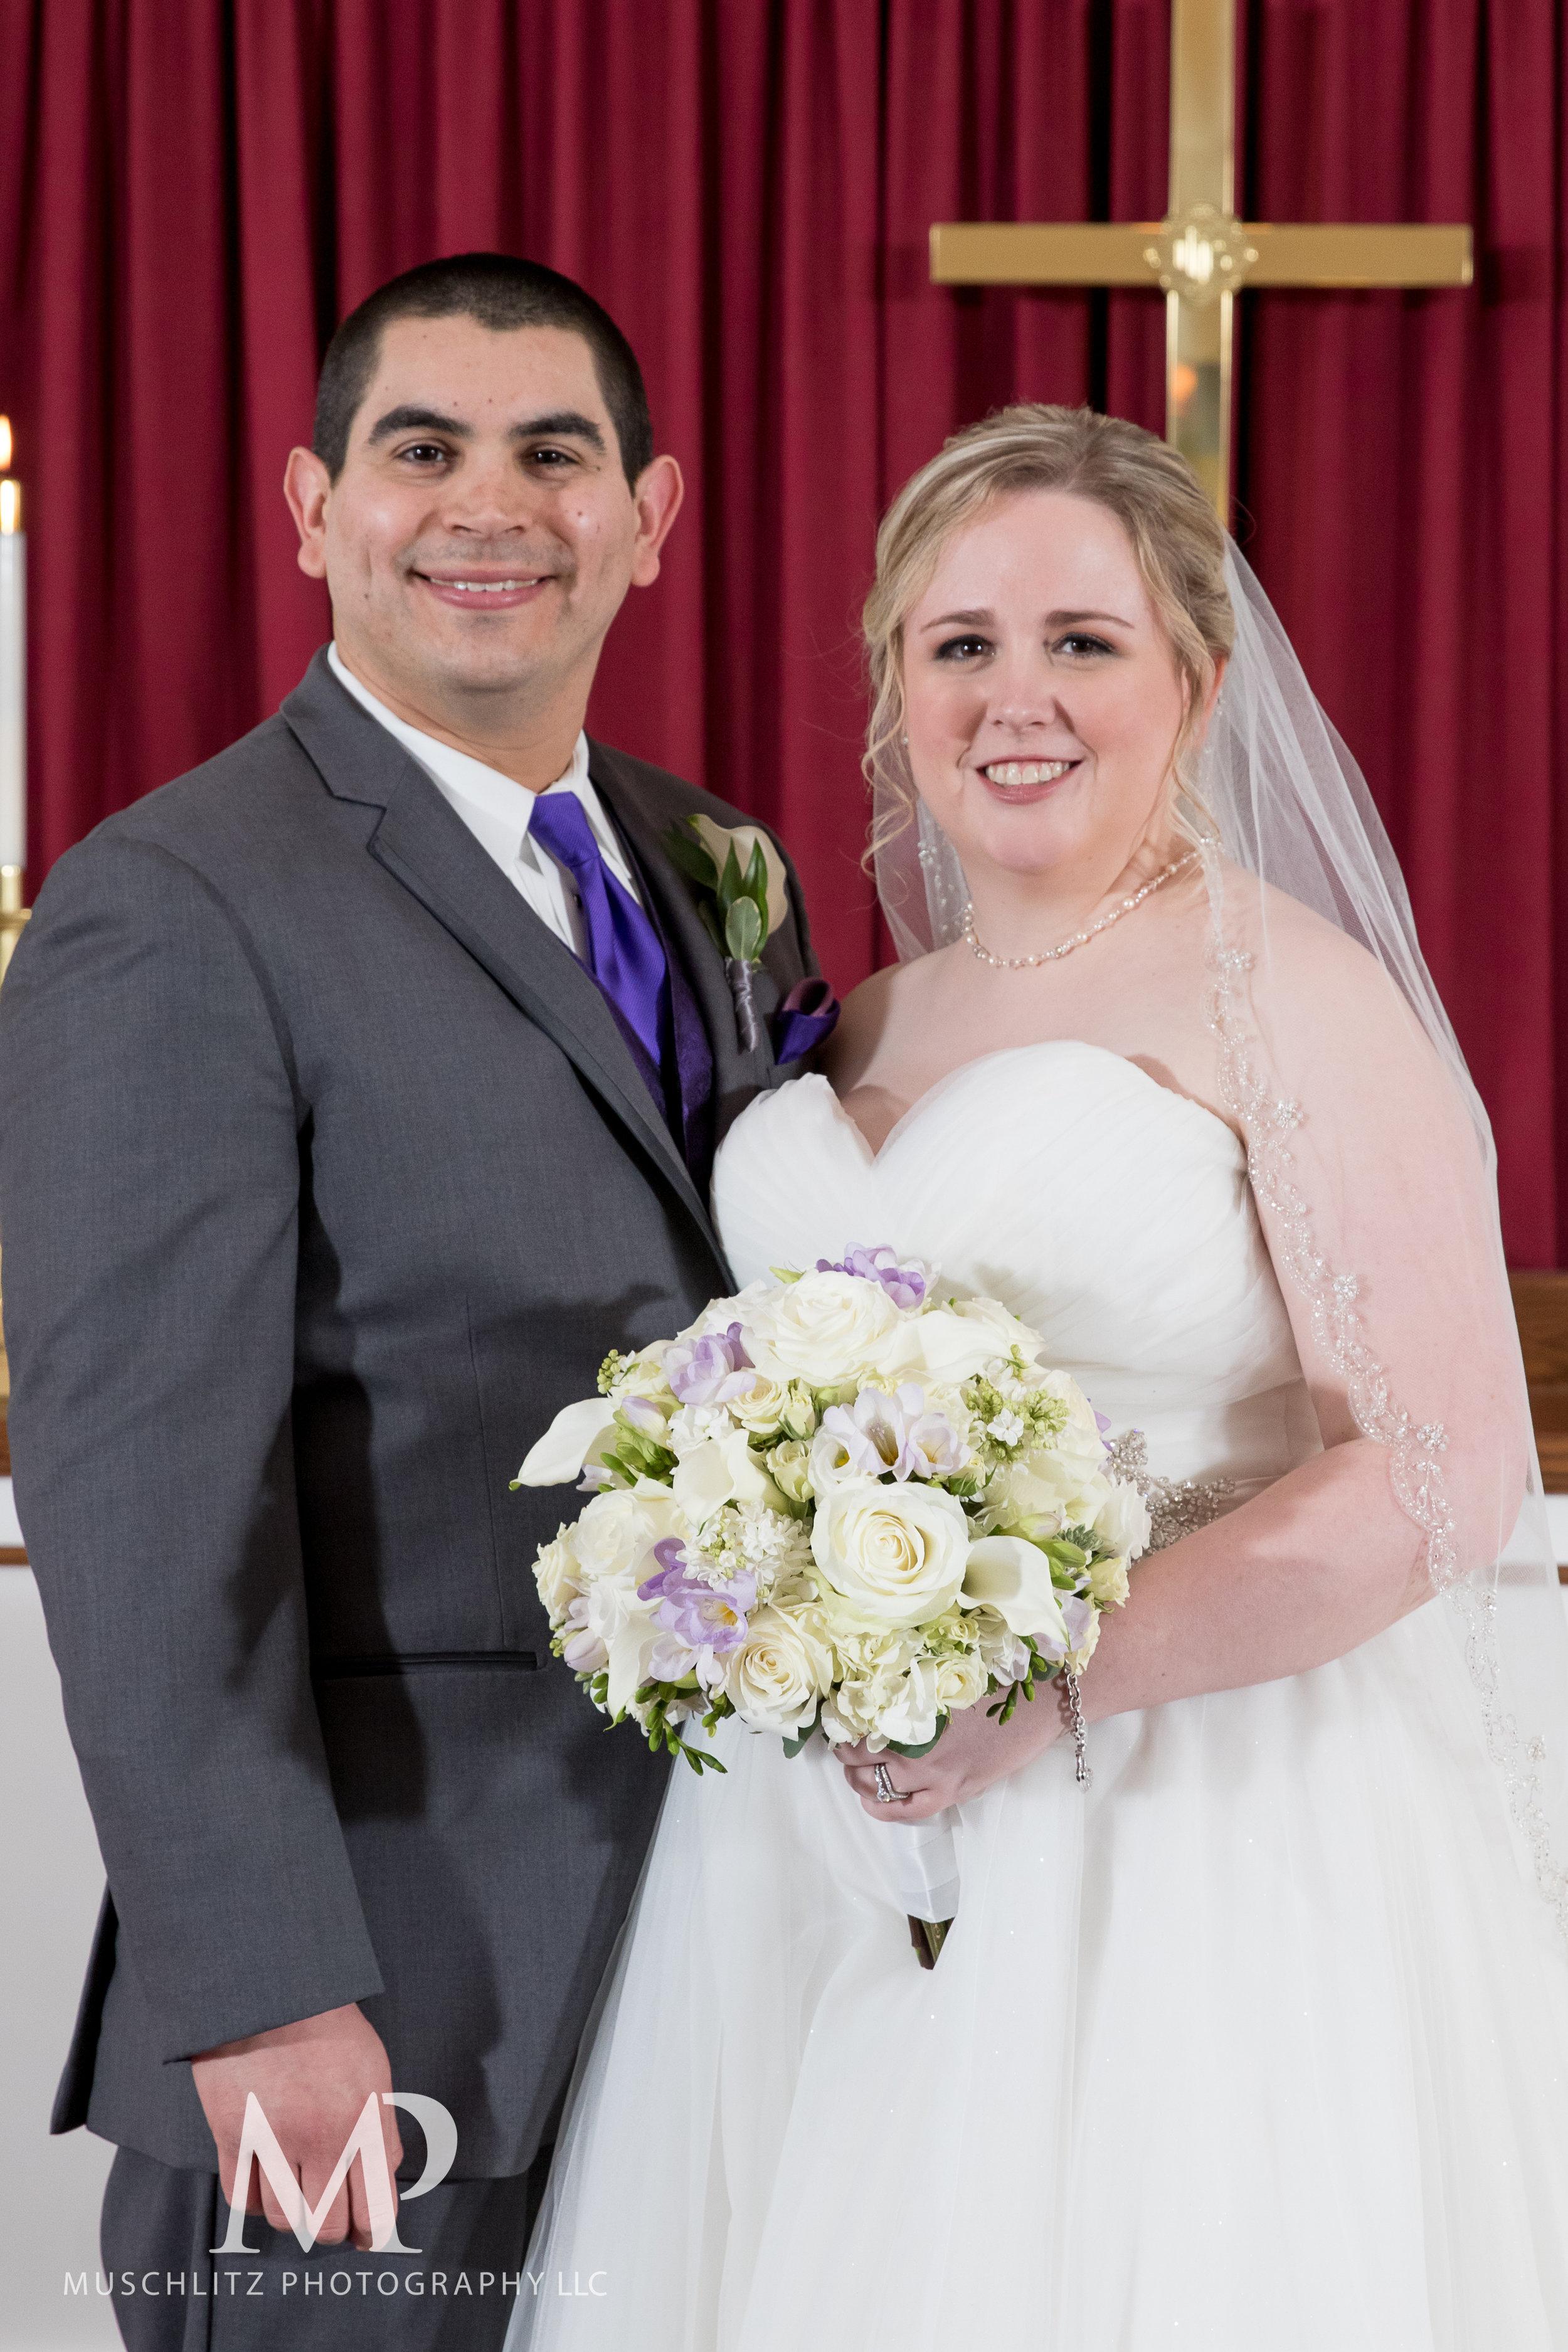 dublin-community-church-wedding-columbus-ohio-muschlitz-photography-074.JPG